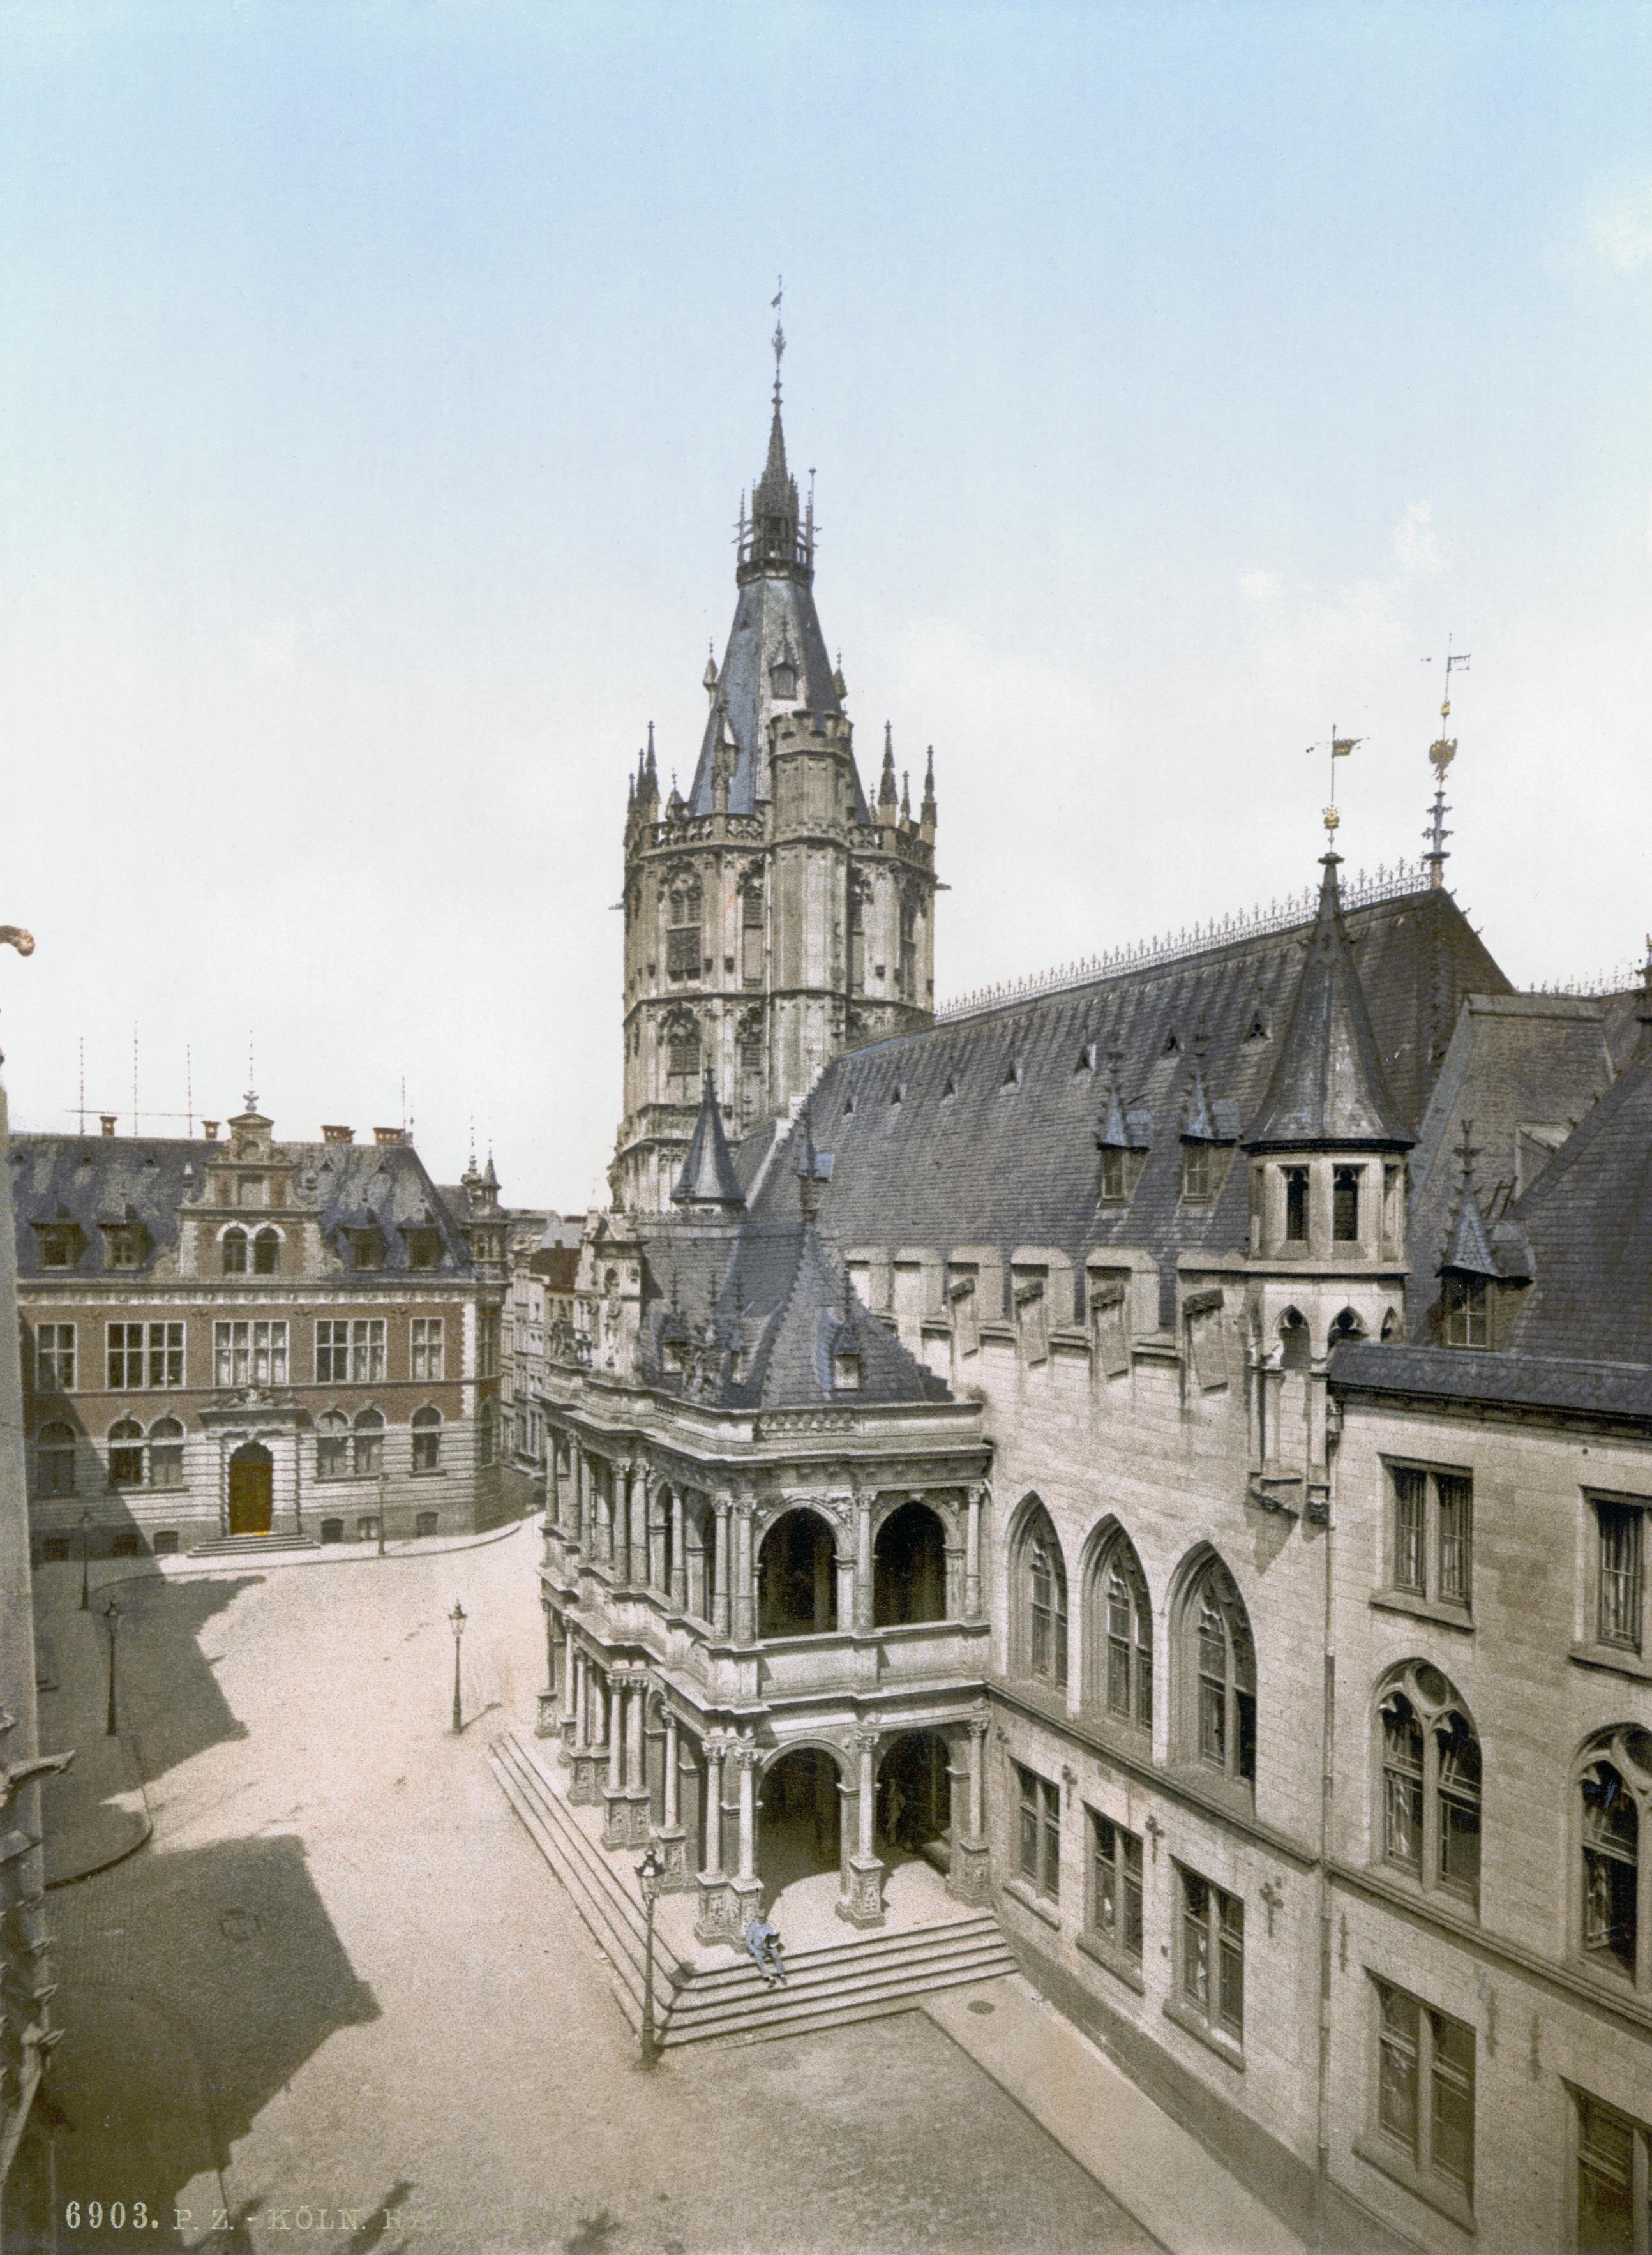 Hotel Cologne Centre Ville